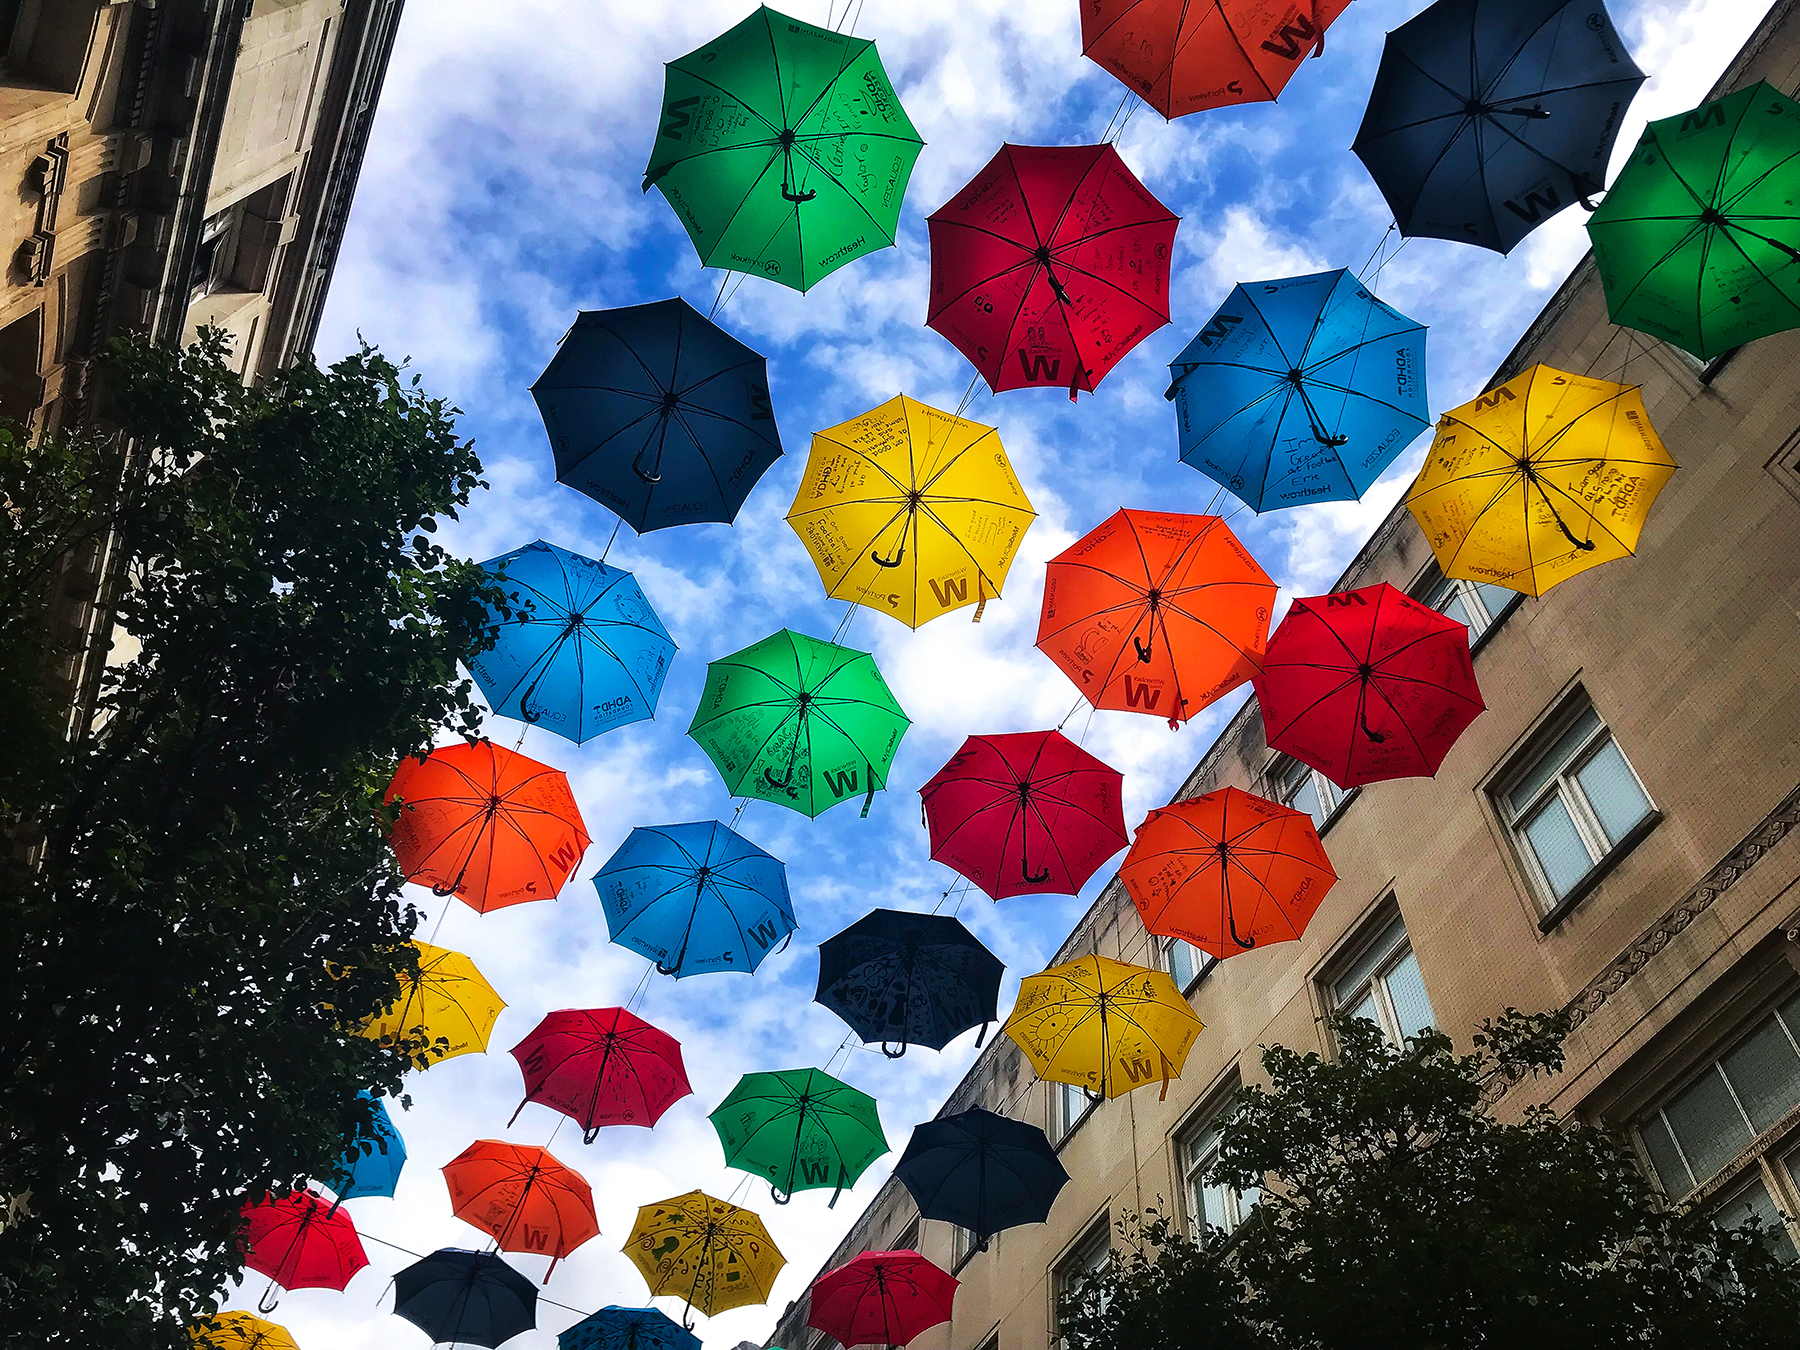 The Umbrella Project, Church Alley, Live